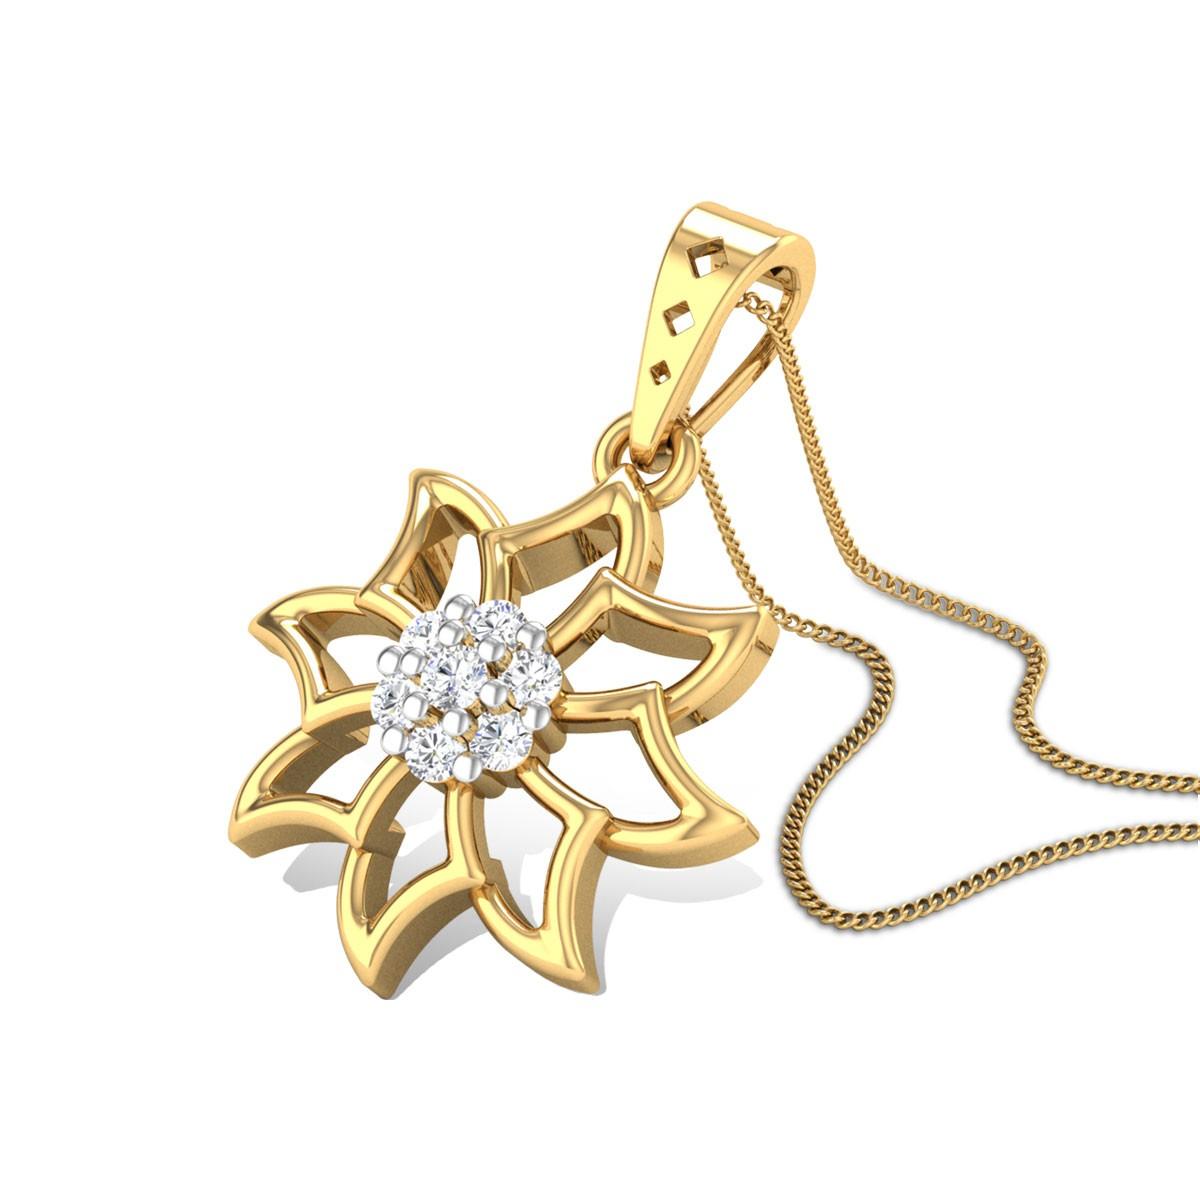 Tulipia Diamond Pendant